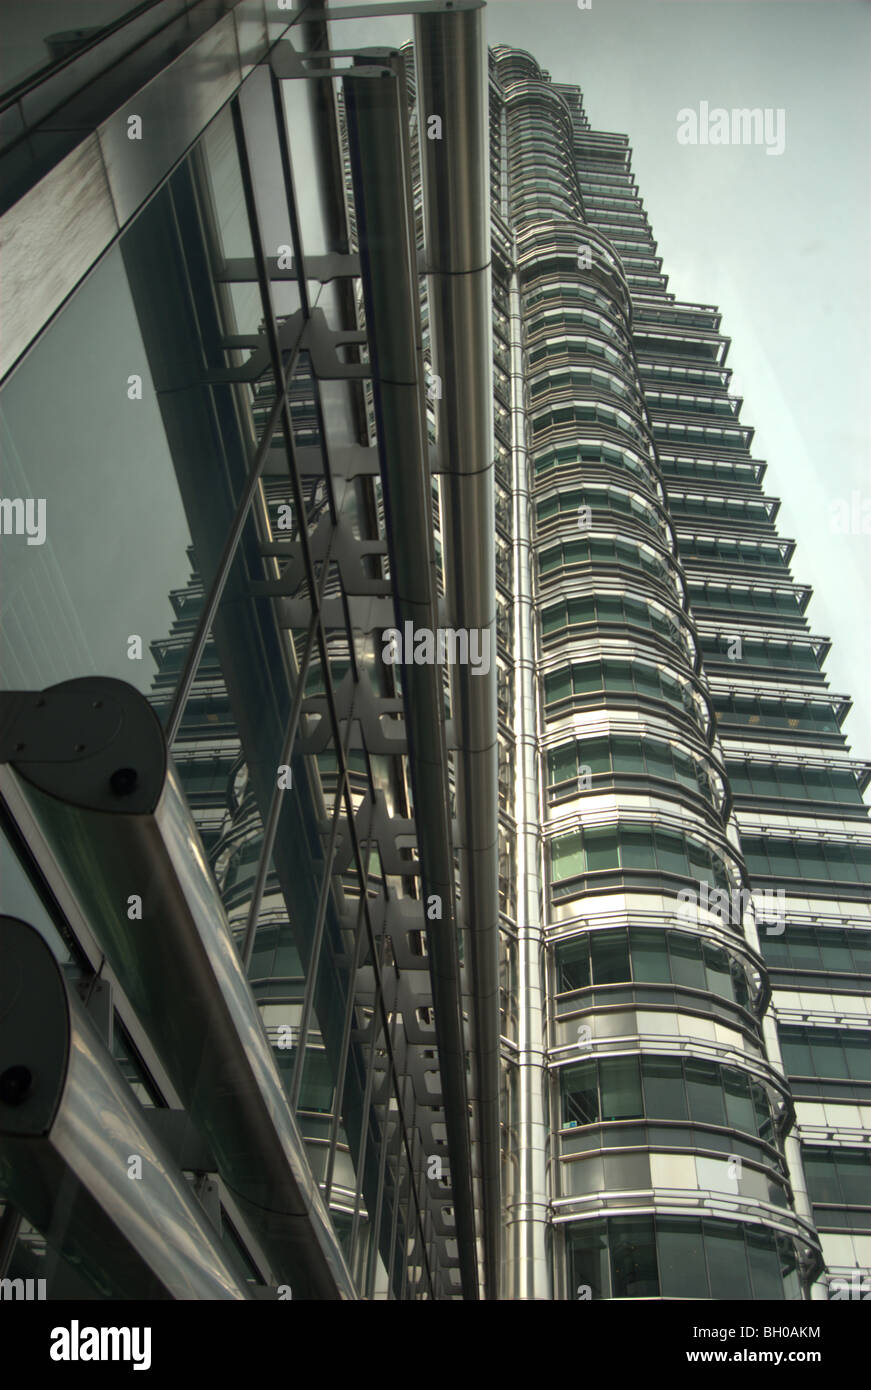 View looking up the Petronas Towers, Kuala Lumpur, Malaysia - Stock Image